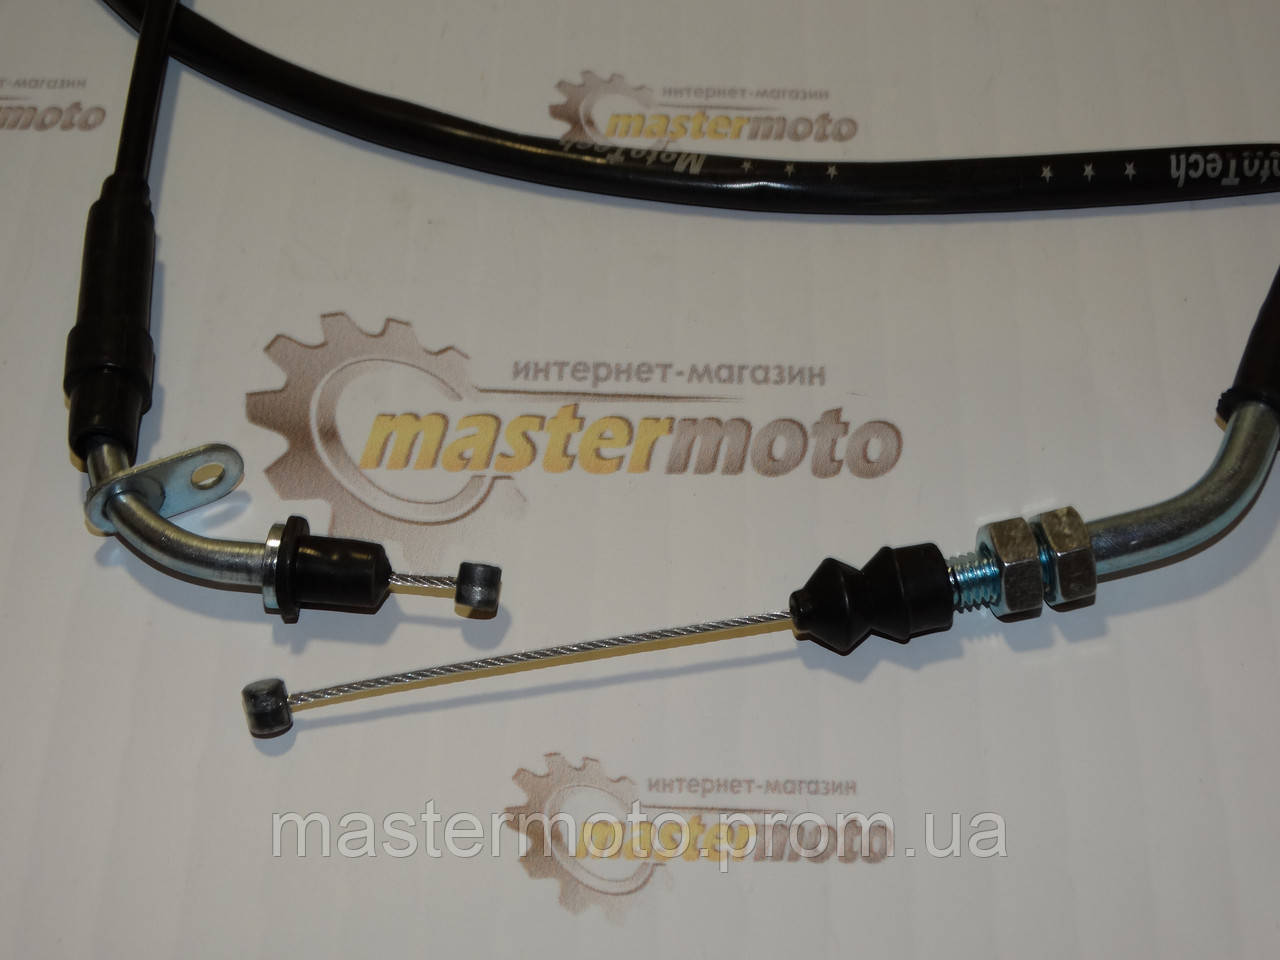 Трос газа для китайского скутера GY6 4T 50-100сс(гайка-пластинка)